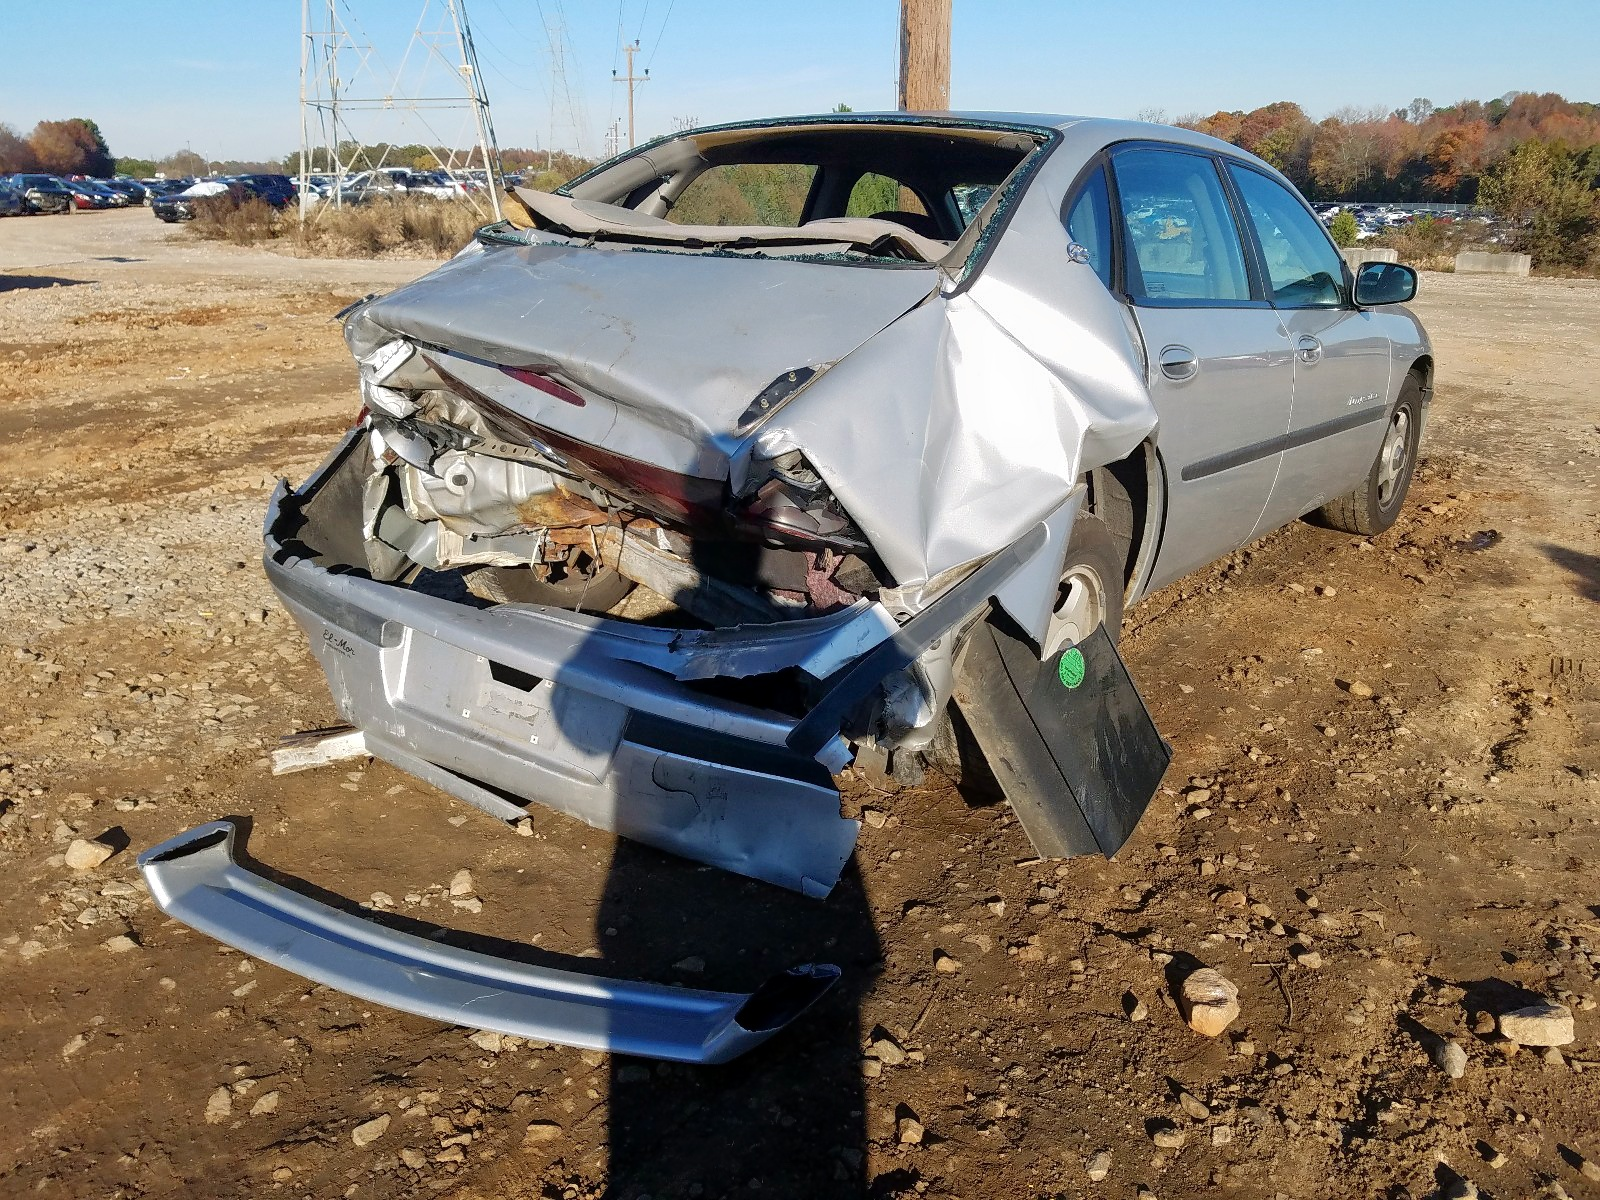 2G1WH55K5Y9130344 - 2000 Chevrolet Impala Ls 3.8L rear view